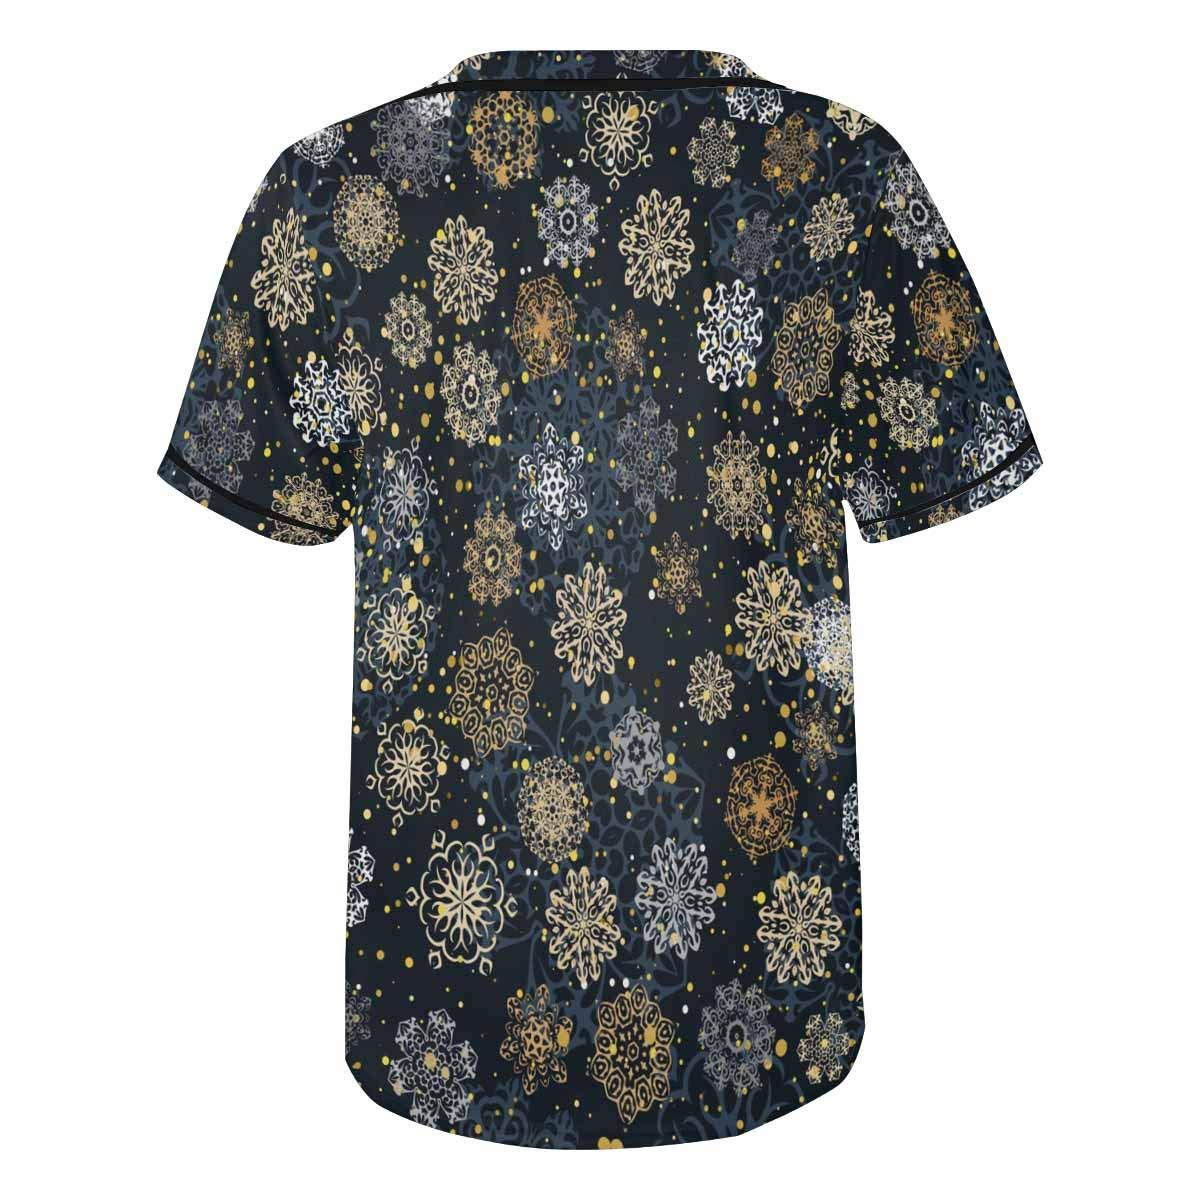 INTERESTPRINT Mens Hipster Short Sleeve Full Button Baseball Jersey Shirts Christmas Snowflake